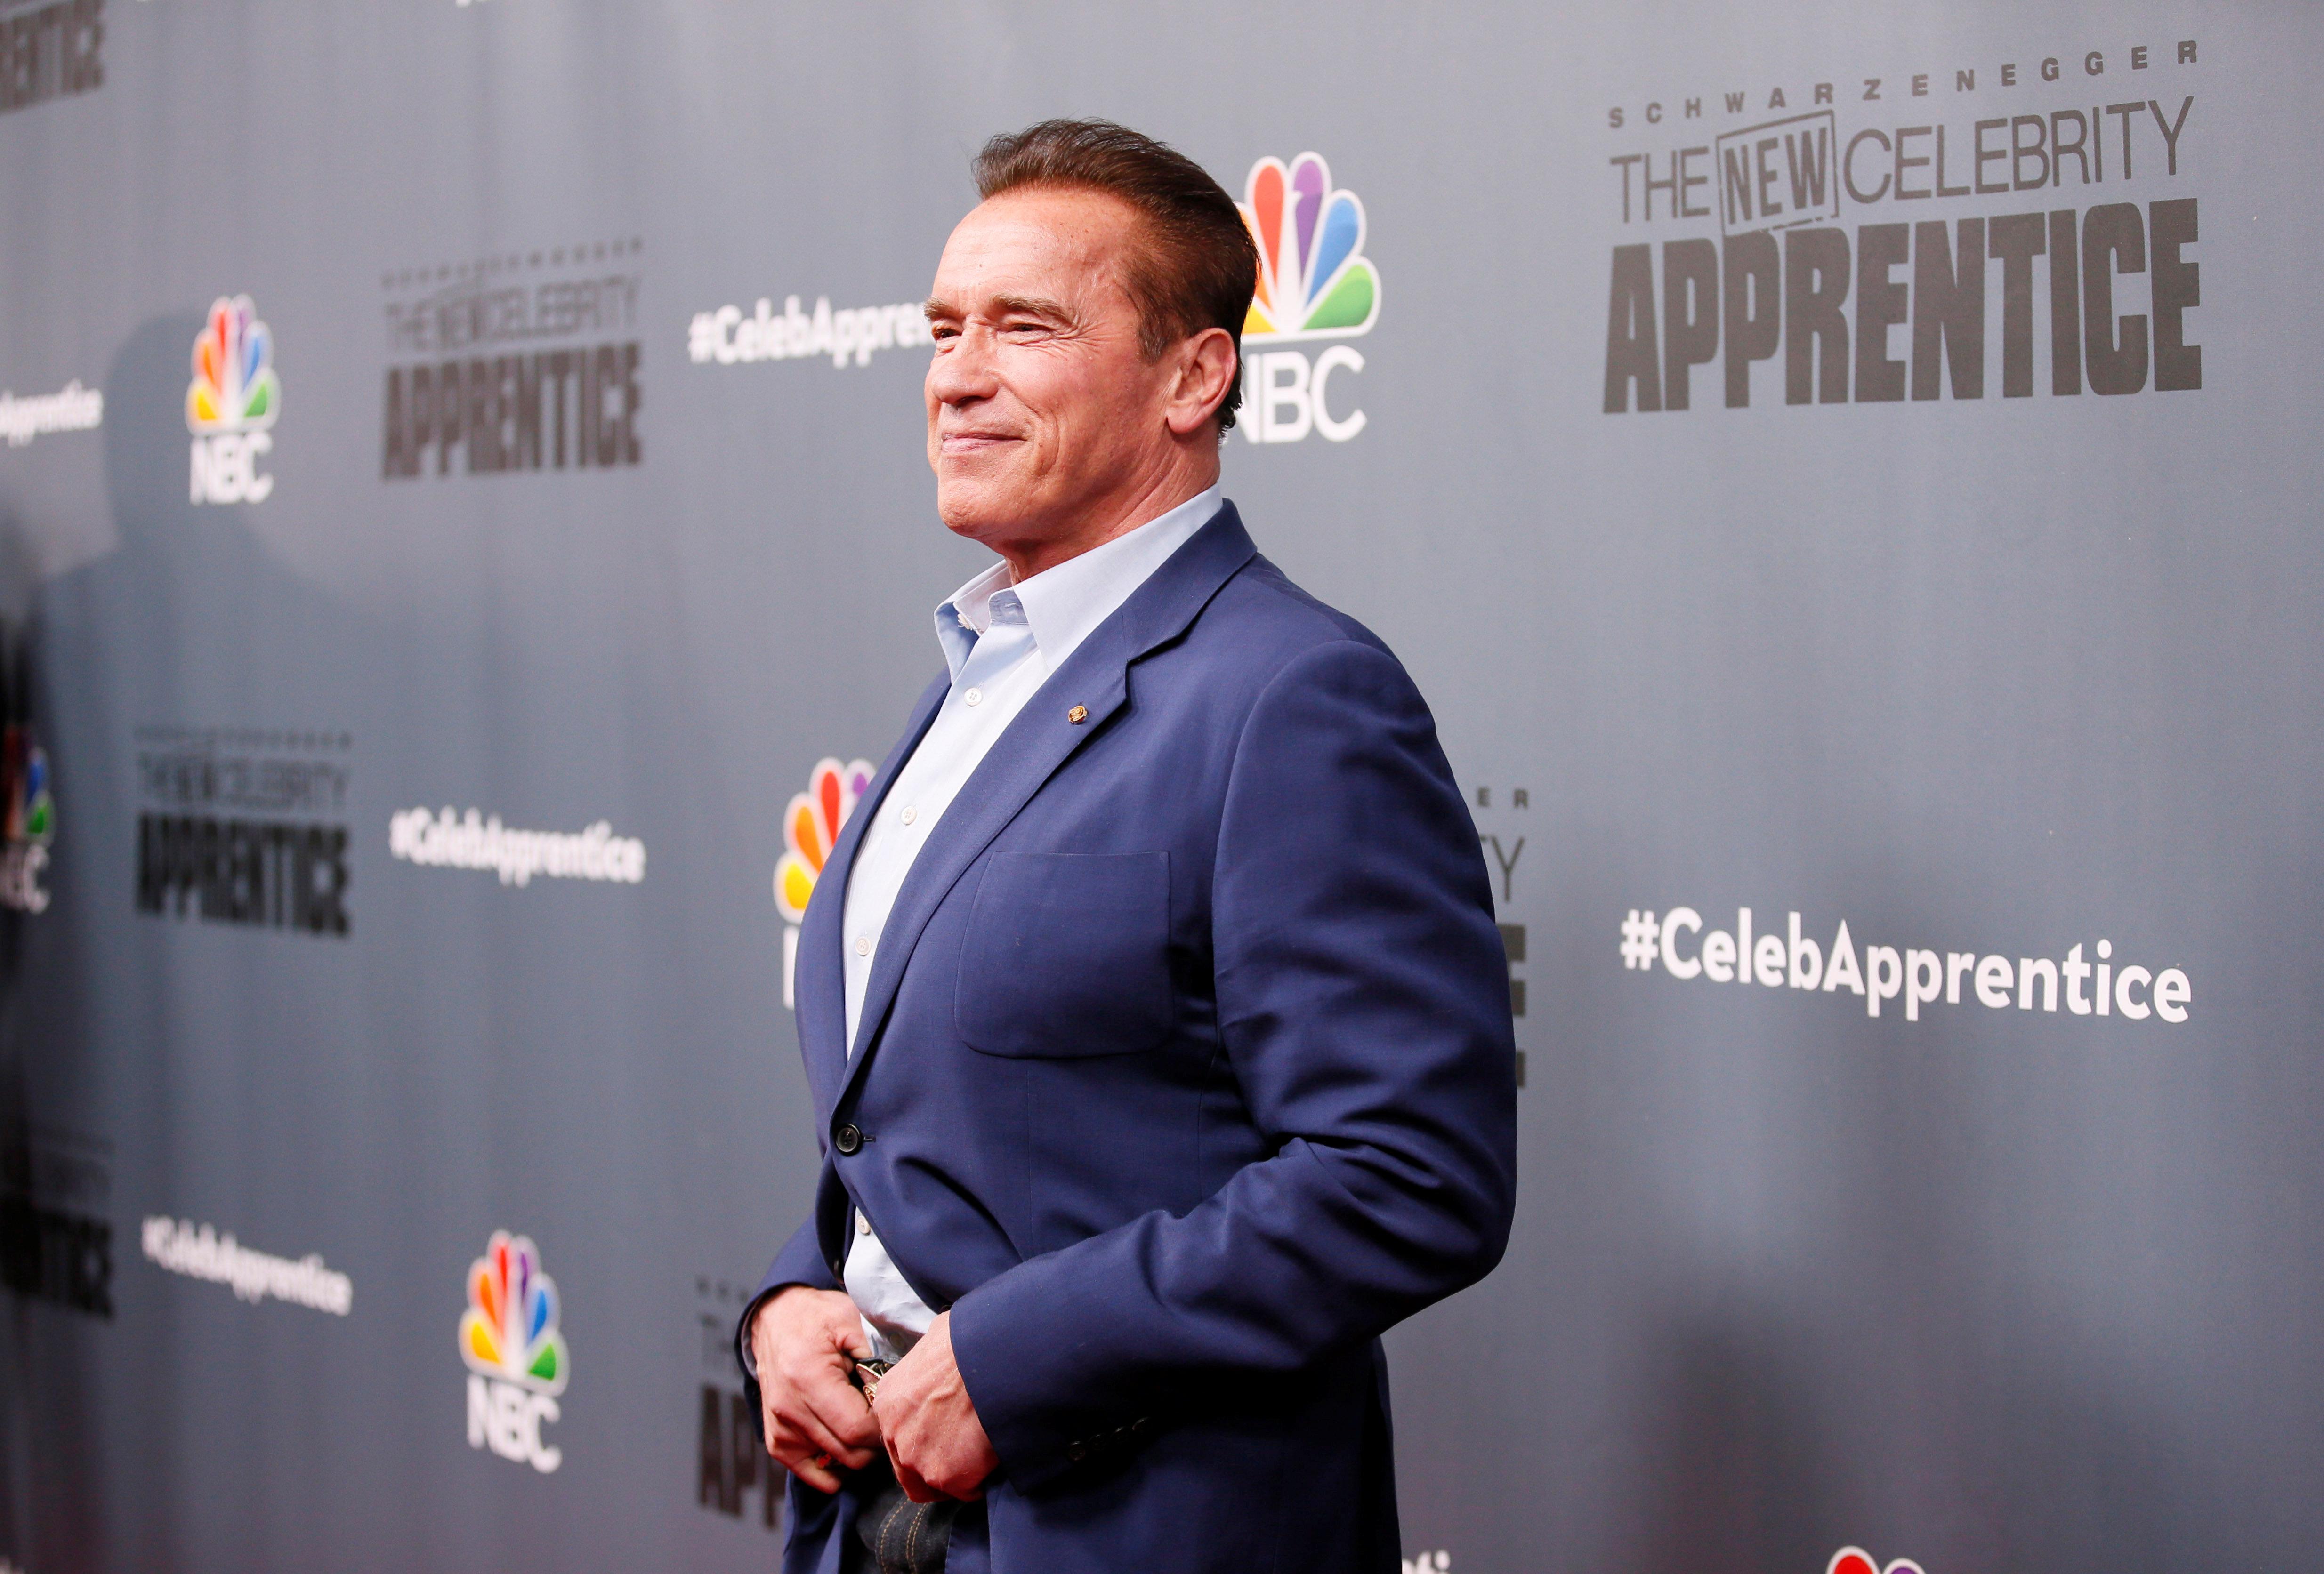 Arnold Schwarzenegger said he doesn't plan to run for U.S. Senate.